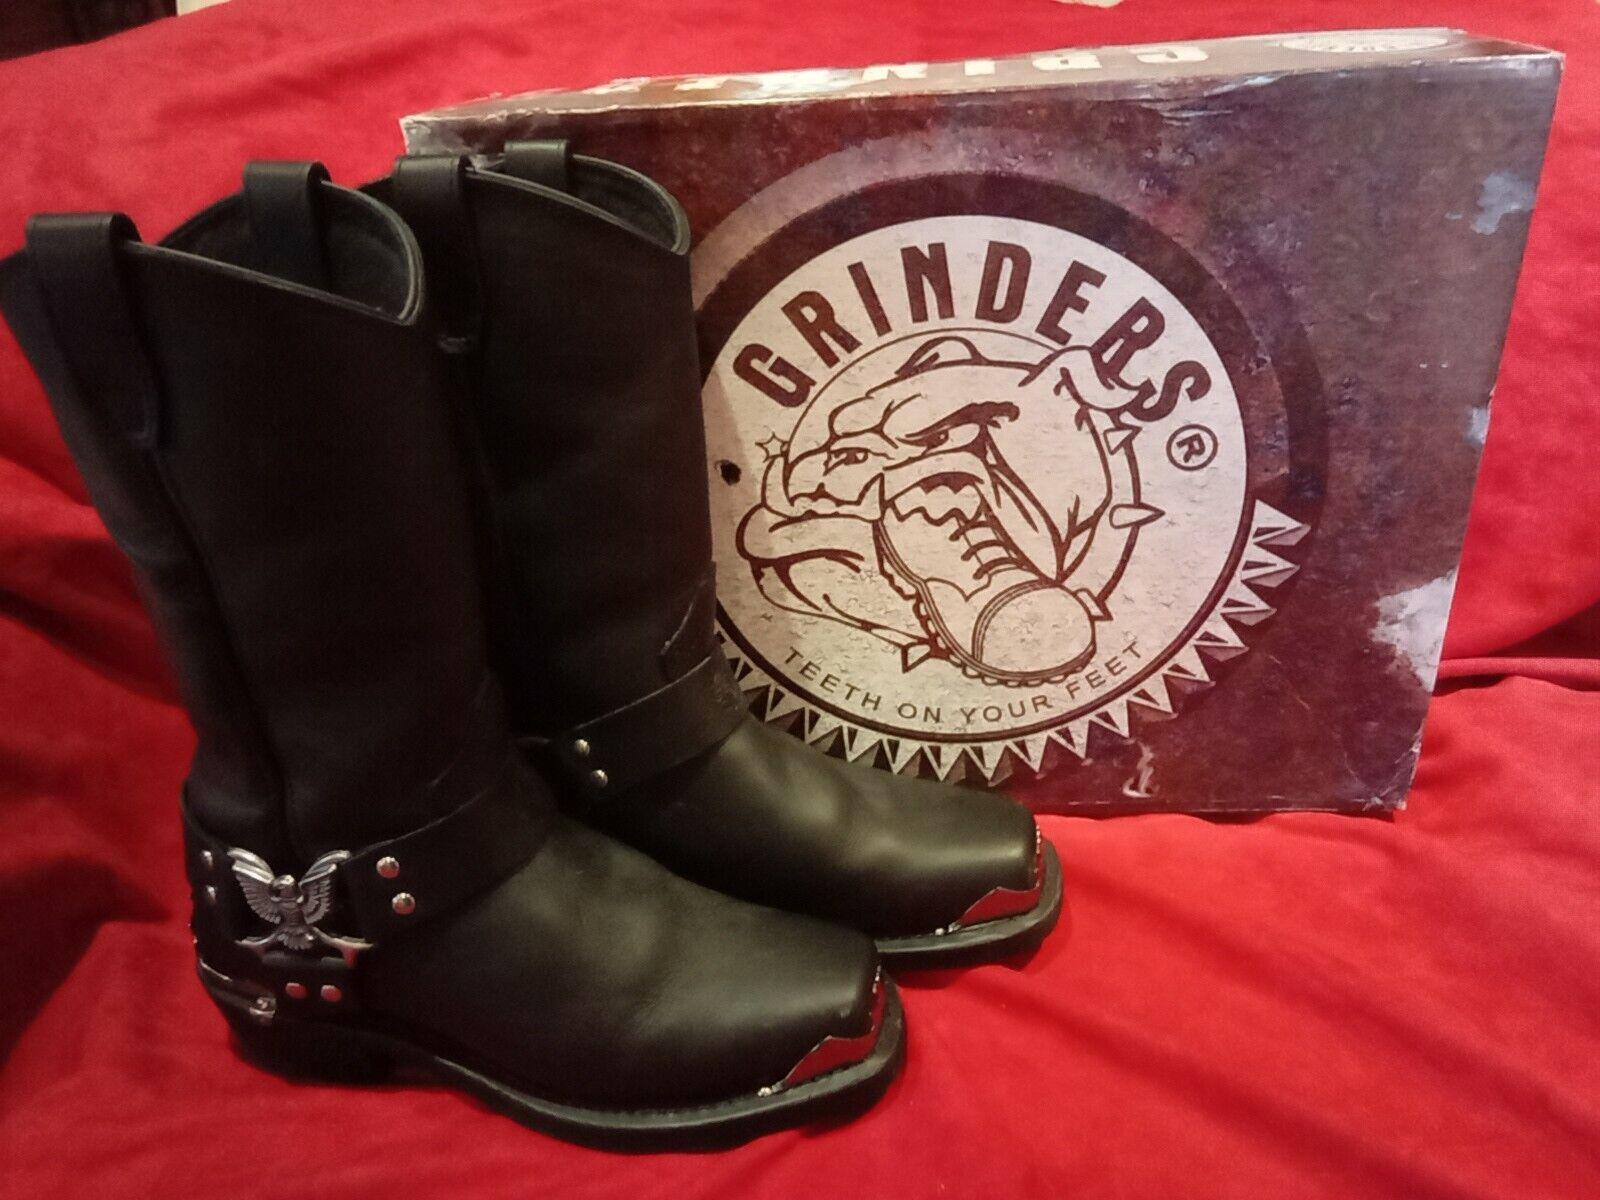 Grinder Eagle Hi Boots Black Leather Size 9 / 42 Worn once in Box (1579)